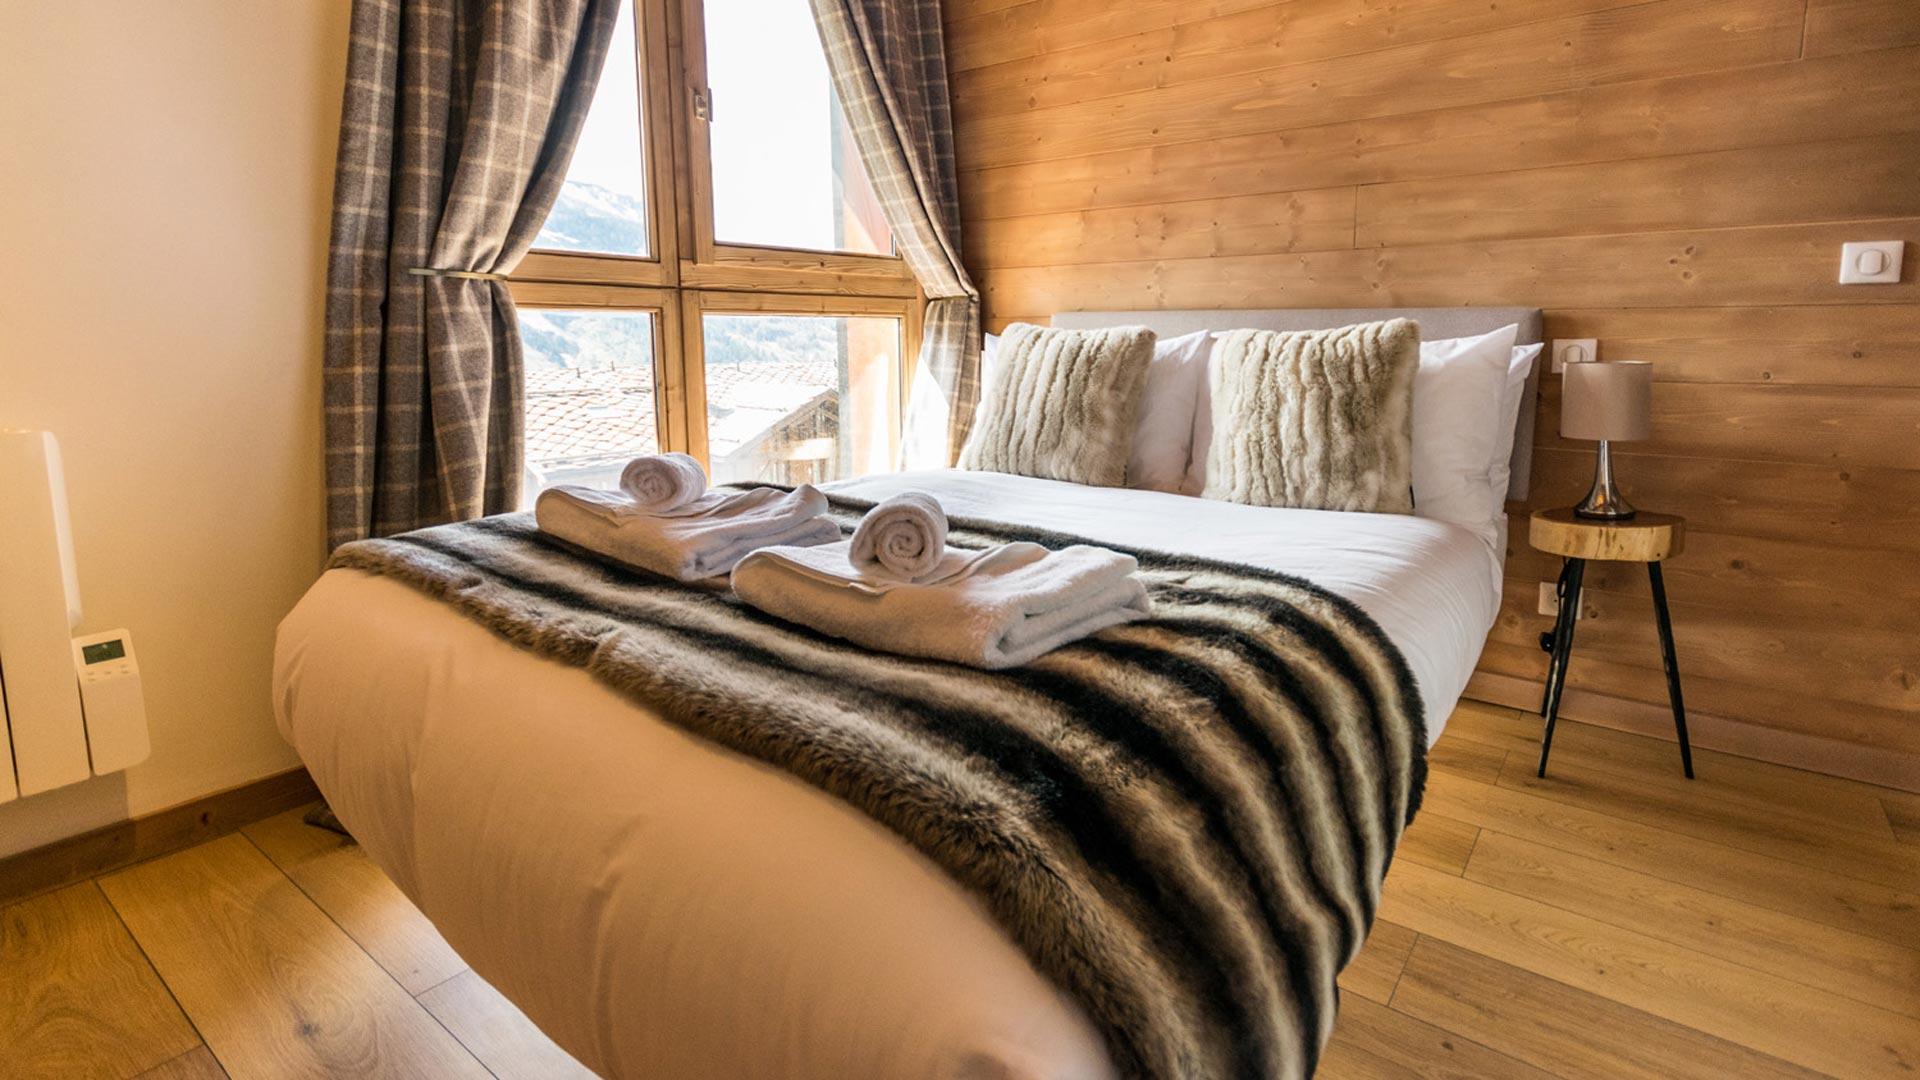 Double Bedroom in Flocon De Neige Apartment in Ste Foy